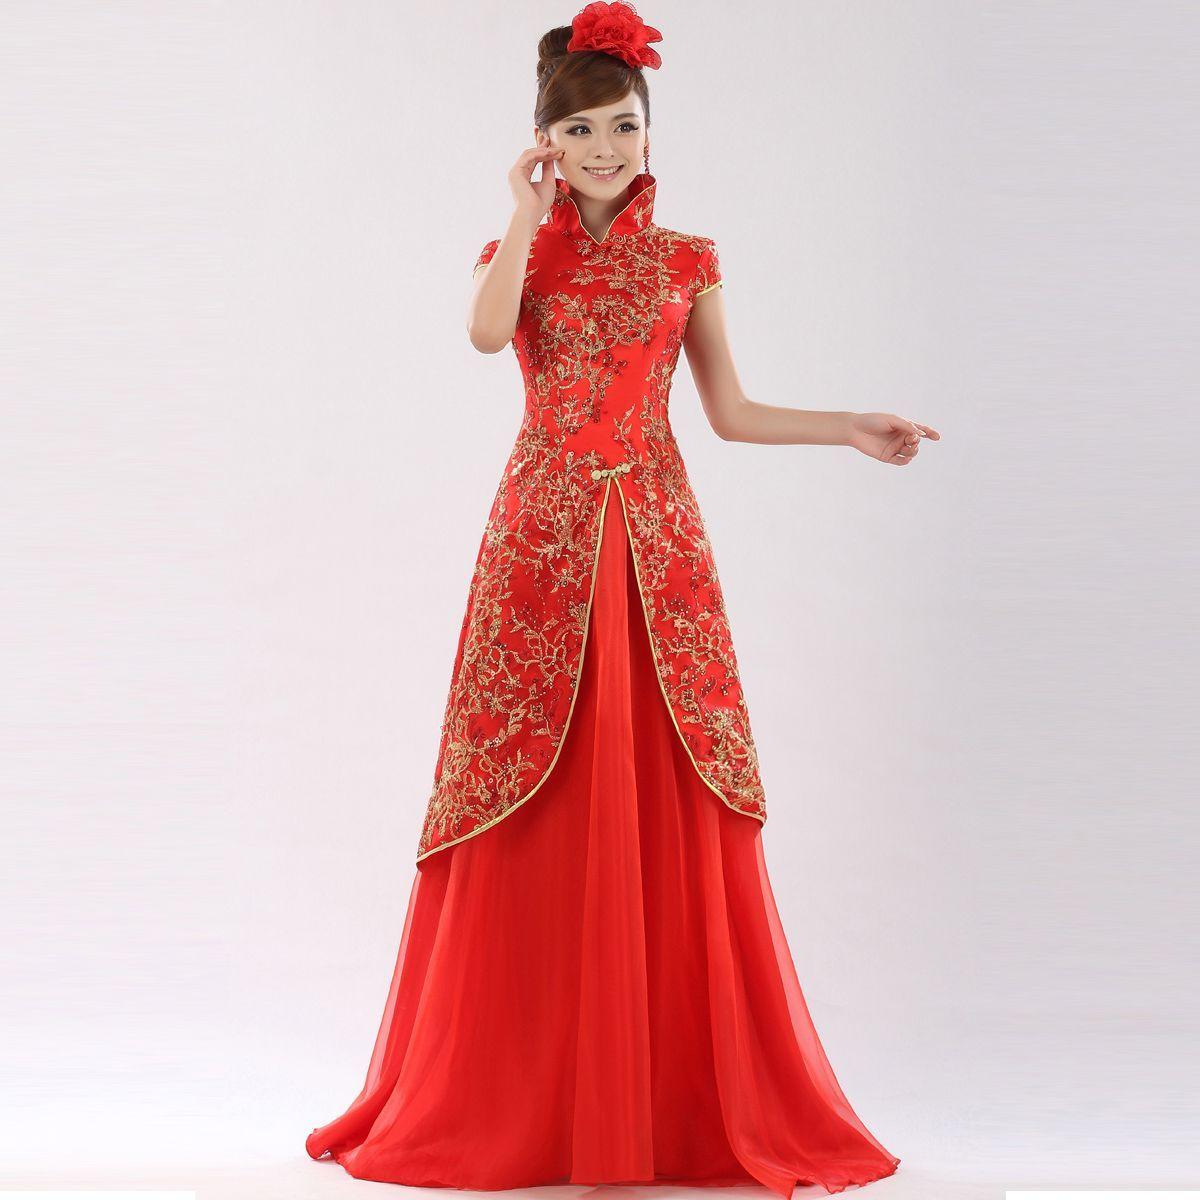 chinese wedding dress traditional wedding dresses SJCWQSK